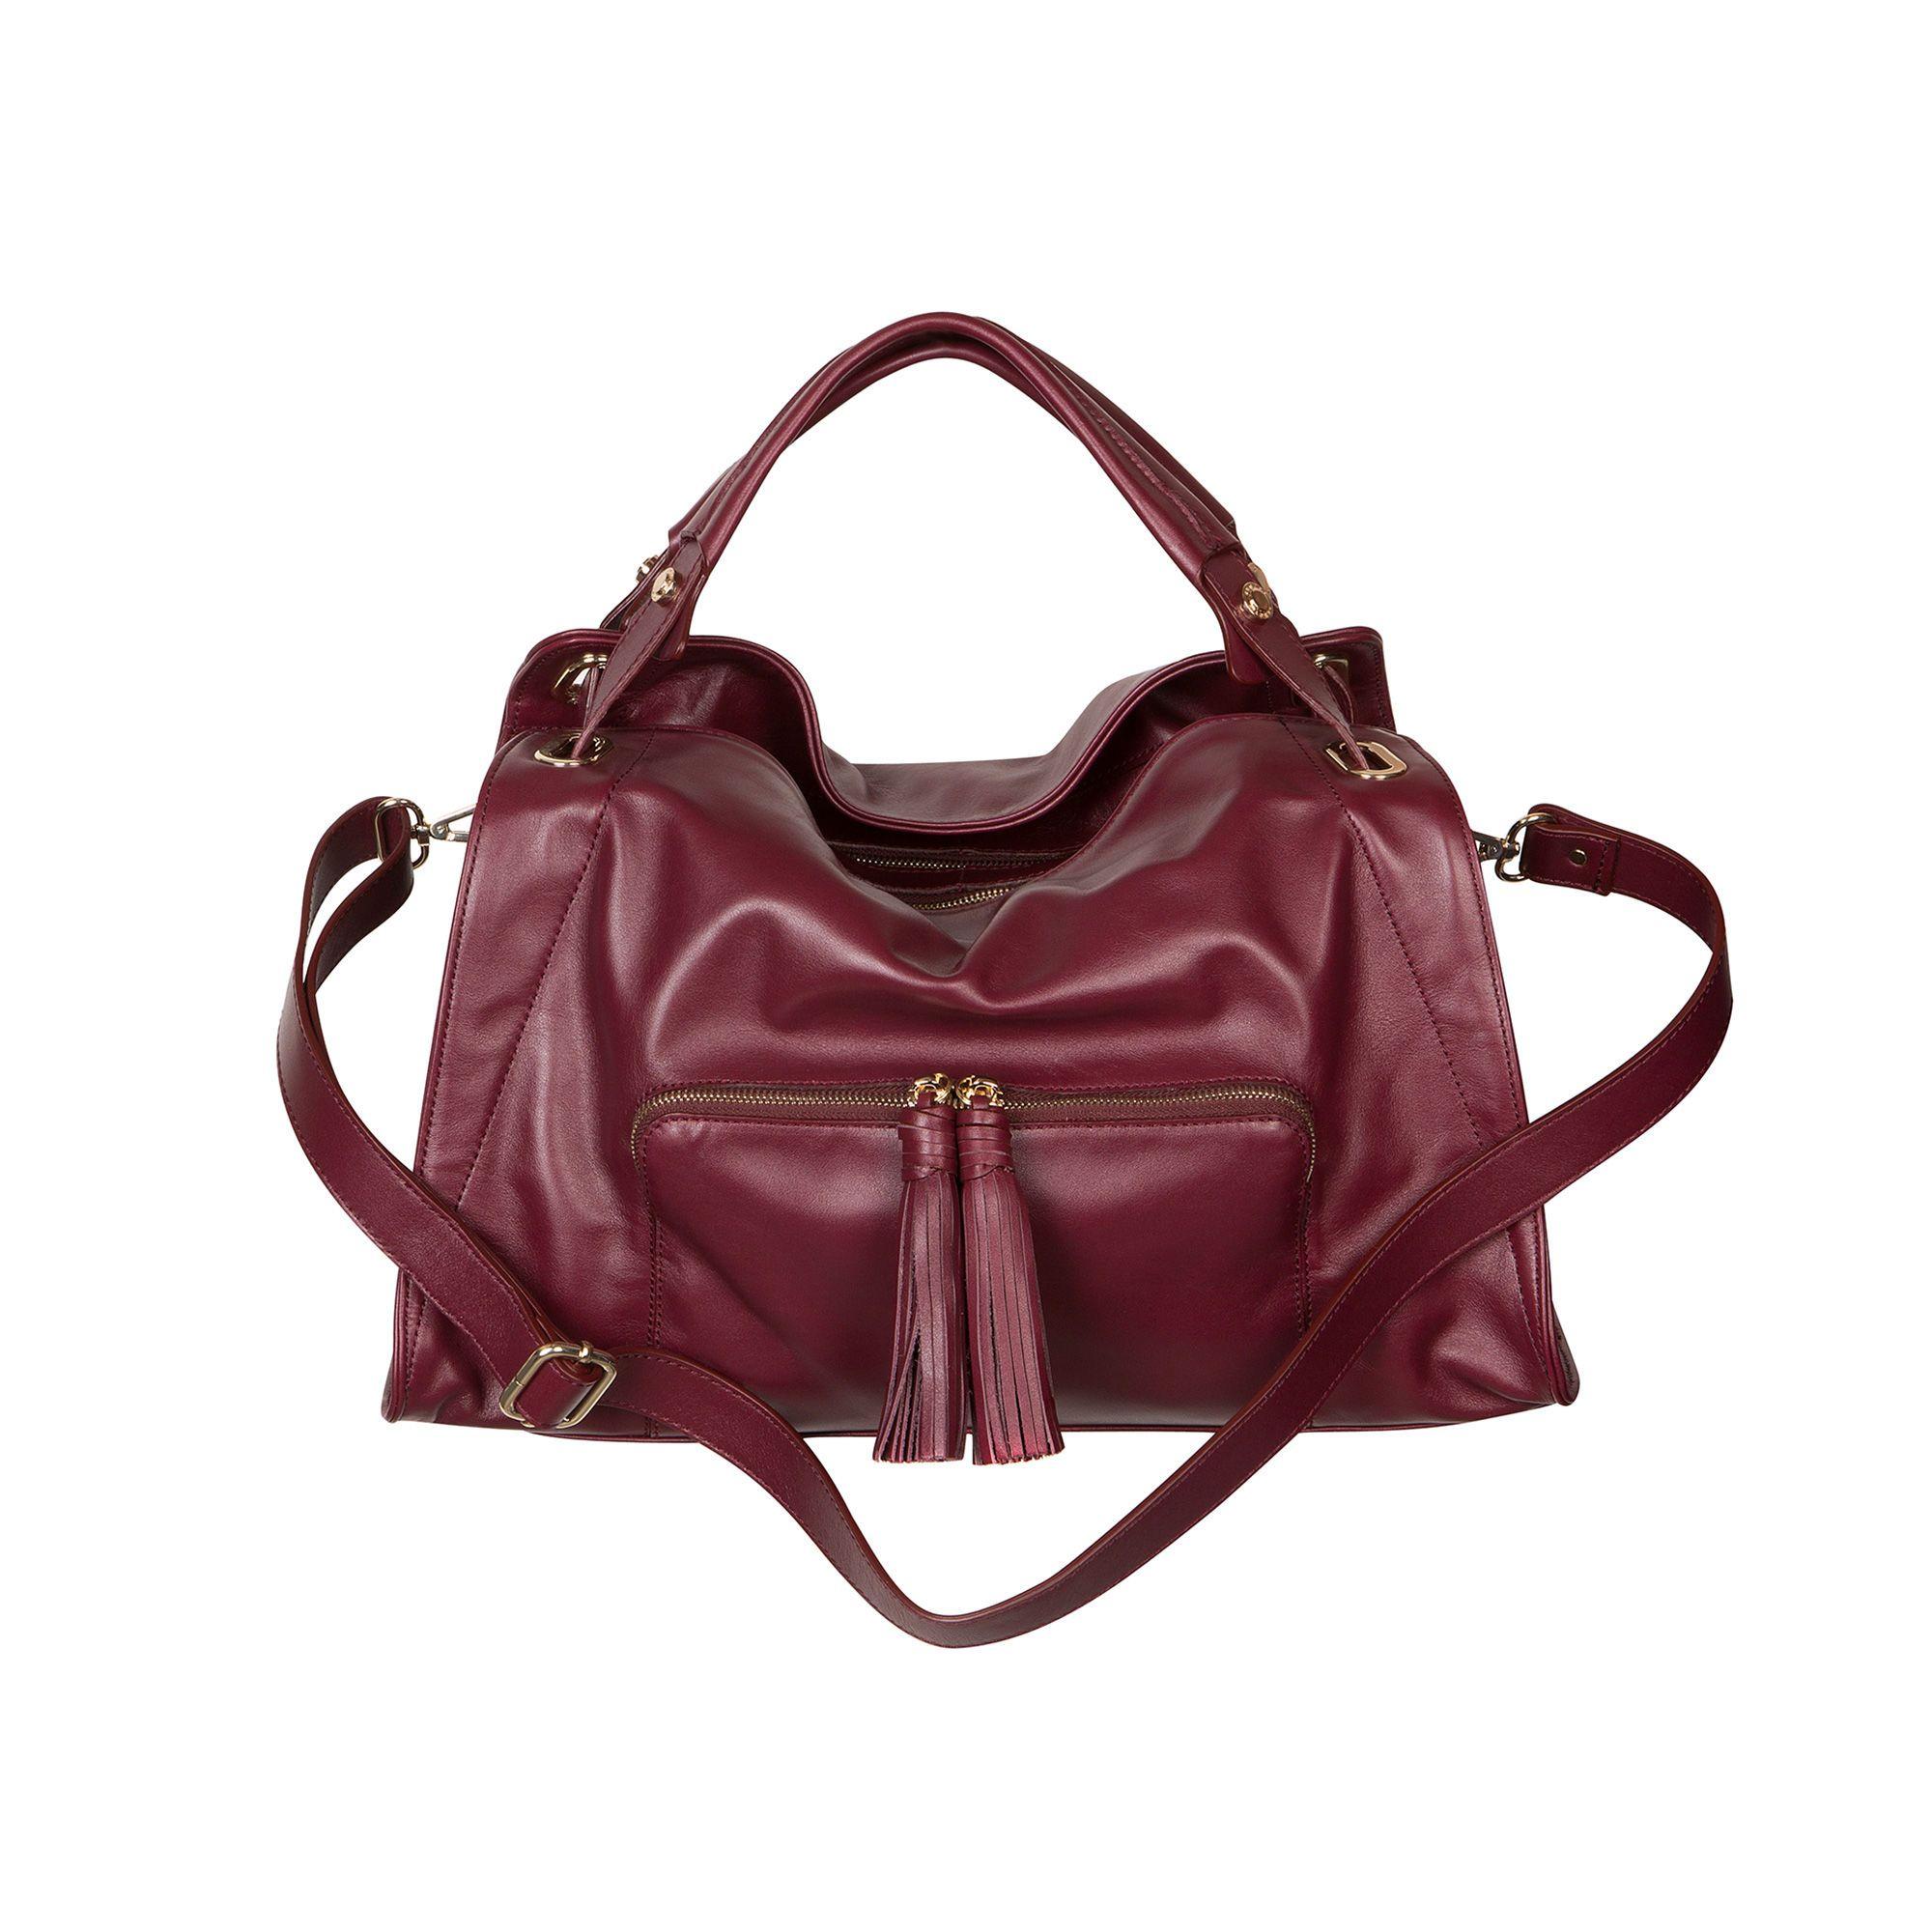 Epingle Sur Sac Purse Bourse Tote Messenger Bag Handbag